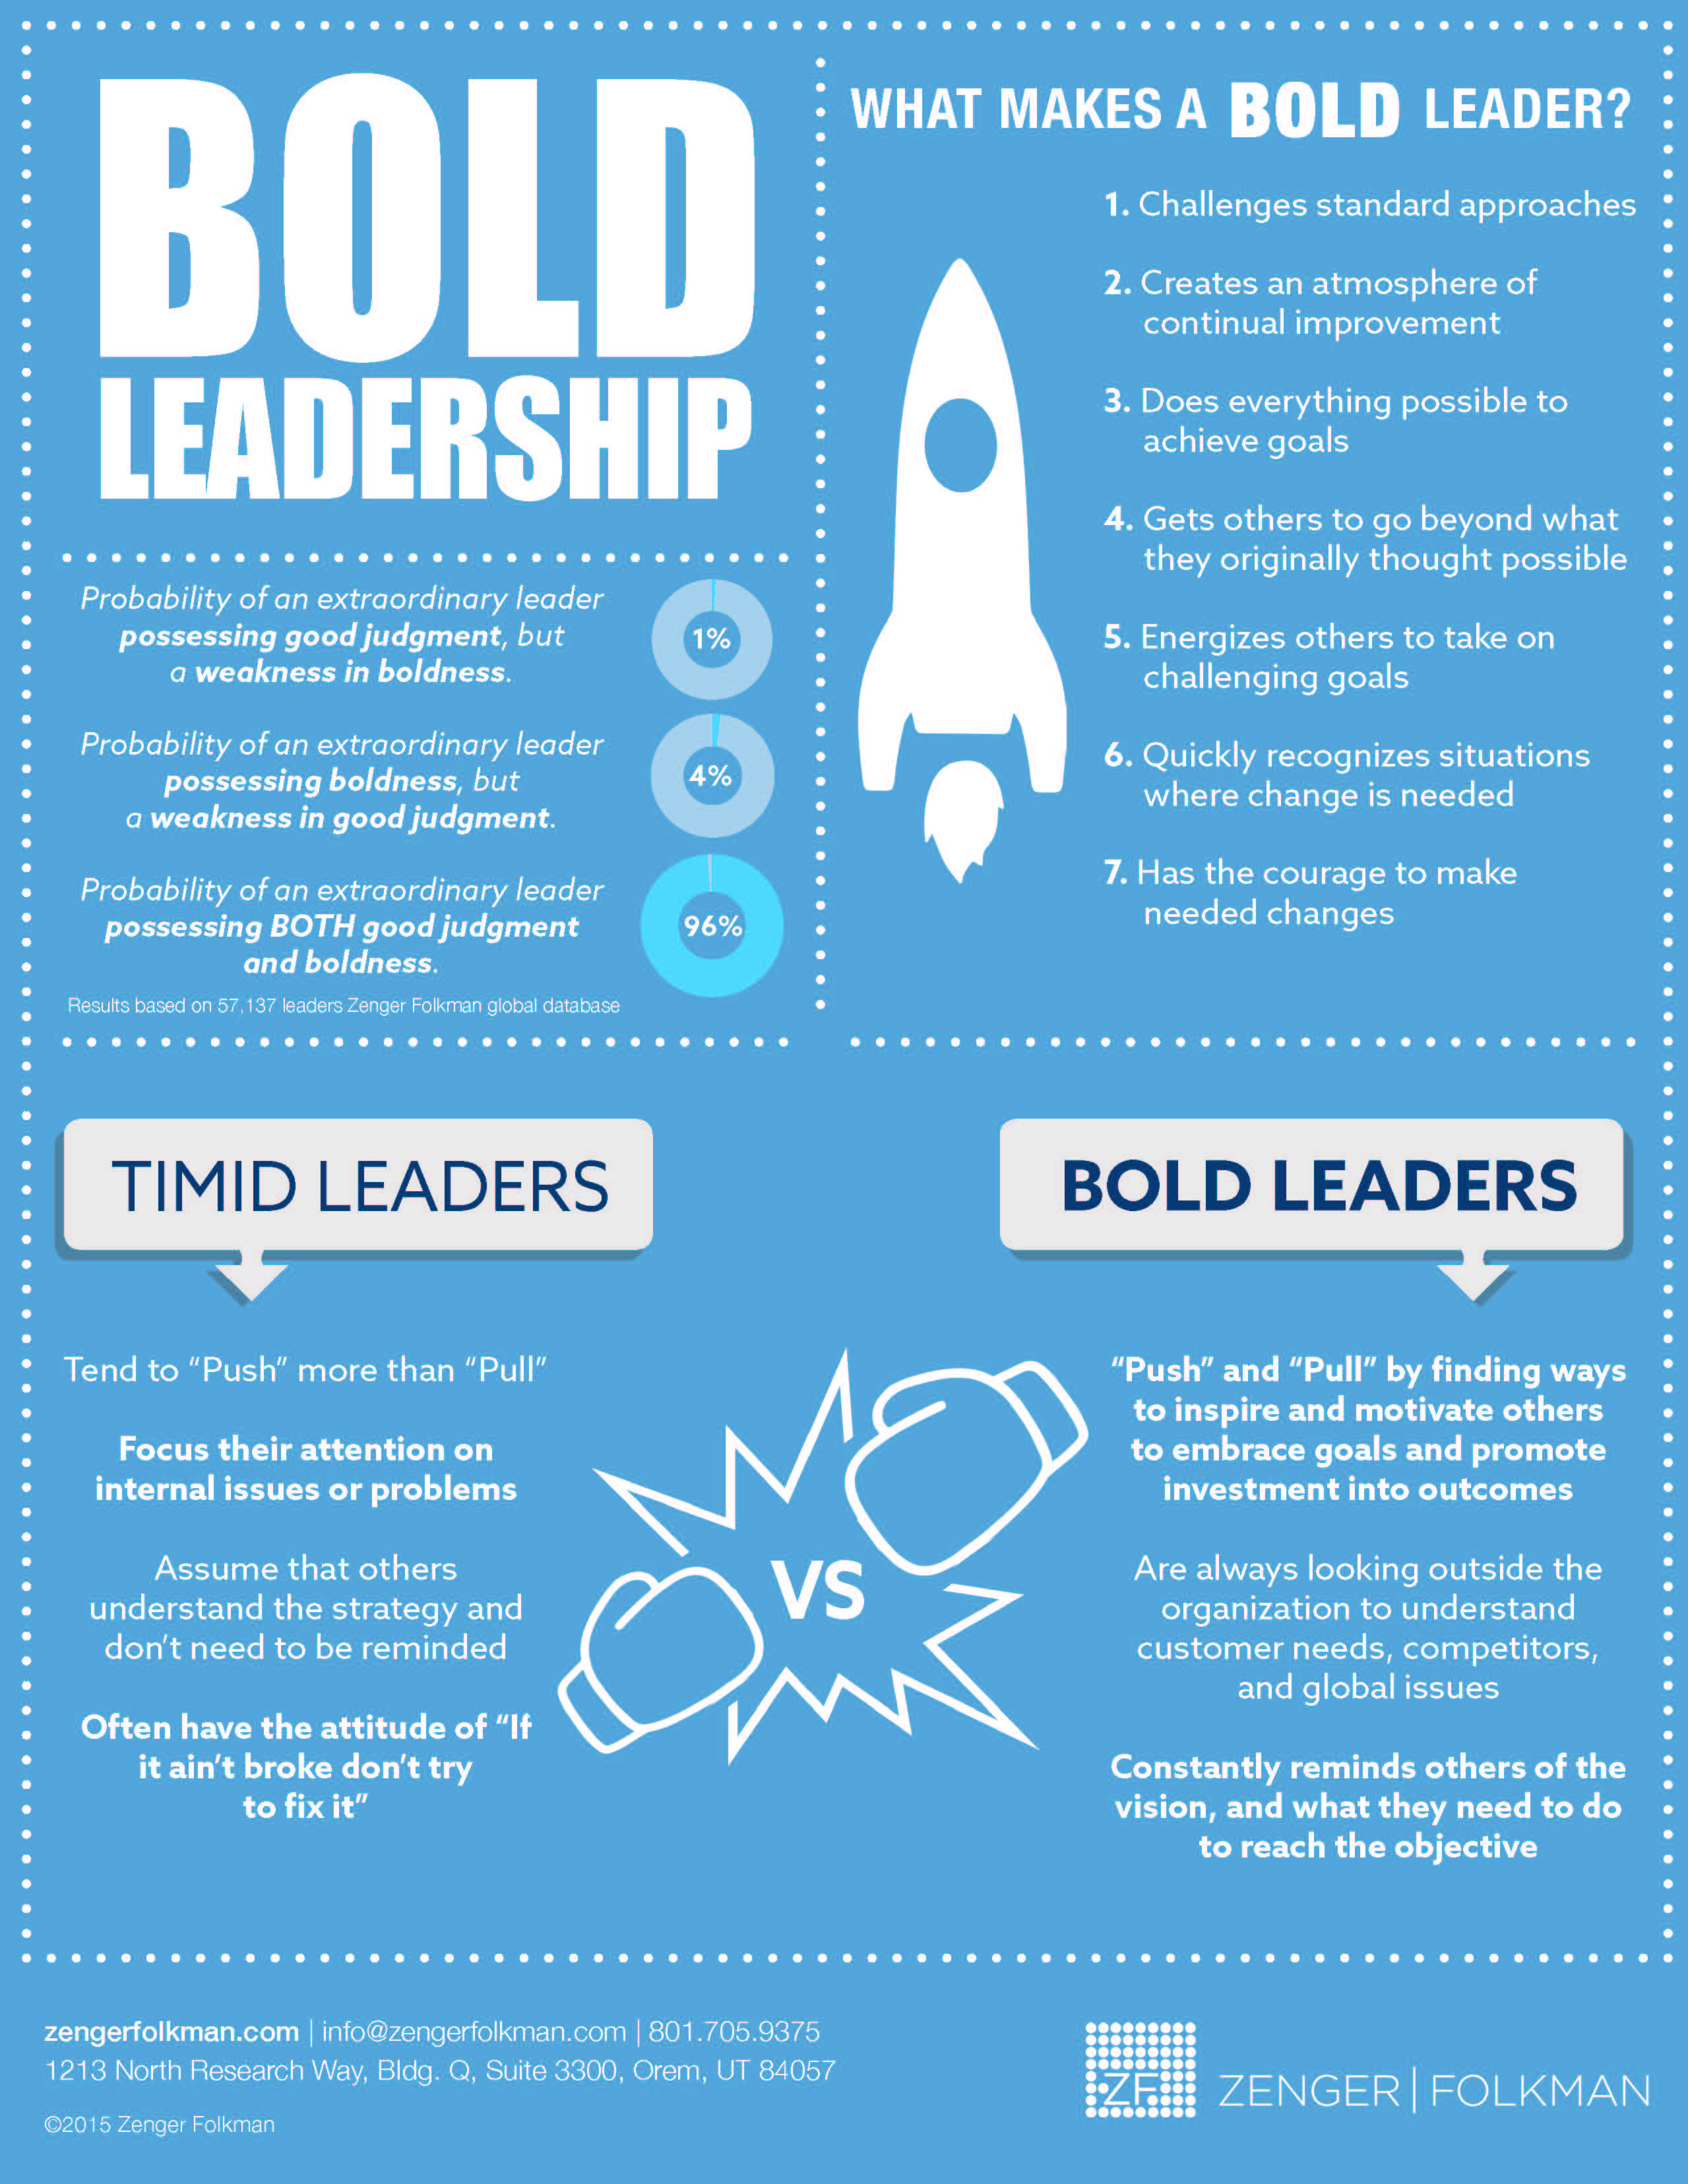 Bold Leadership Infographic 6.18.2015